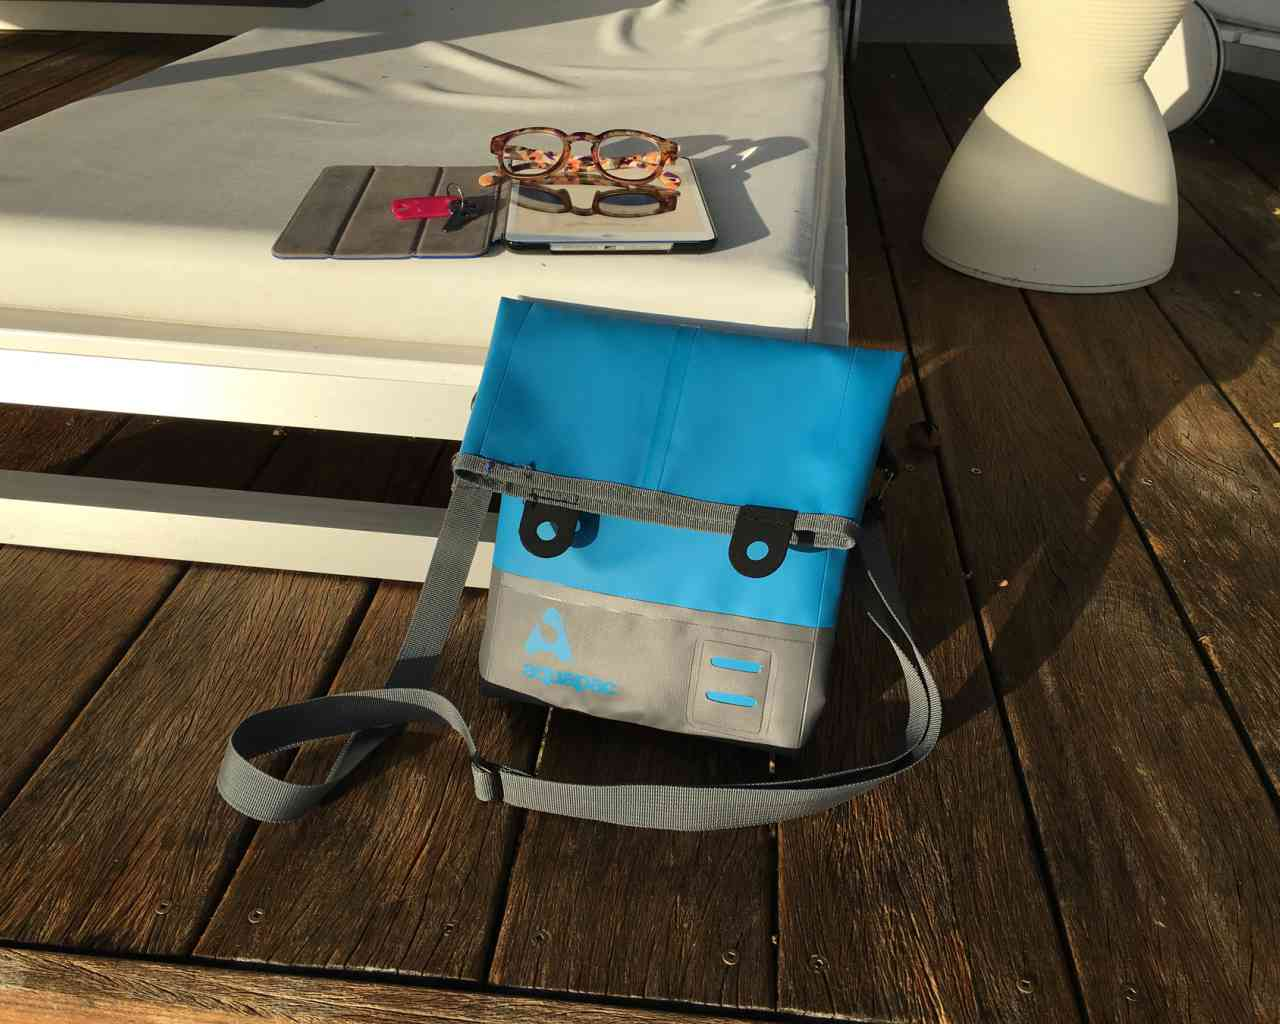 Брызгозащитная сумка Aquapac 052 - TrailProof™ Tote Bag – Small.. Aquapac - №1 в мире водонепроницаемых чехлов и сумок. Фото 6